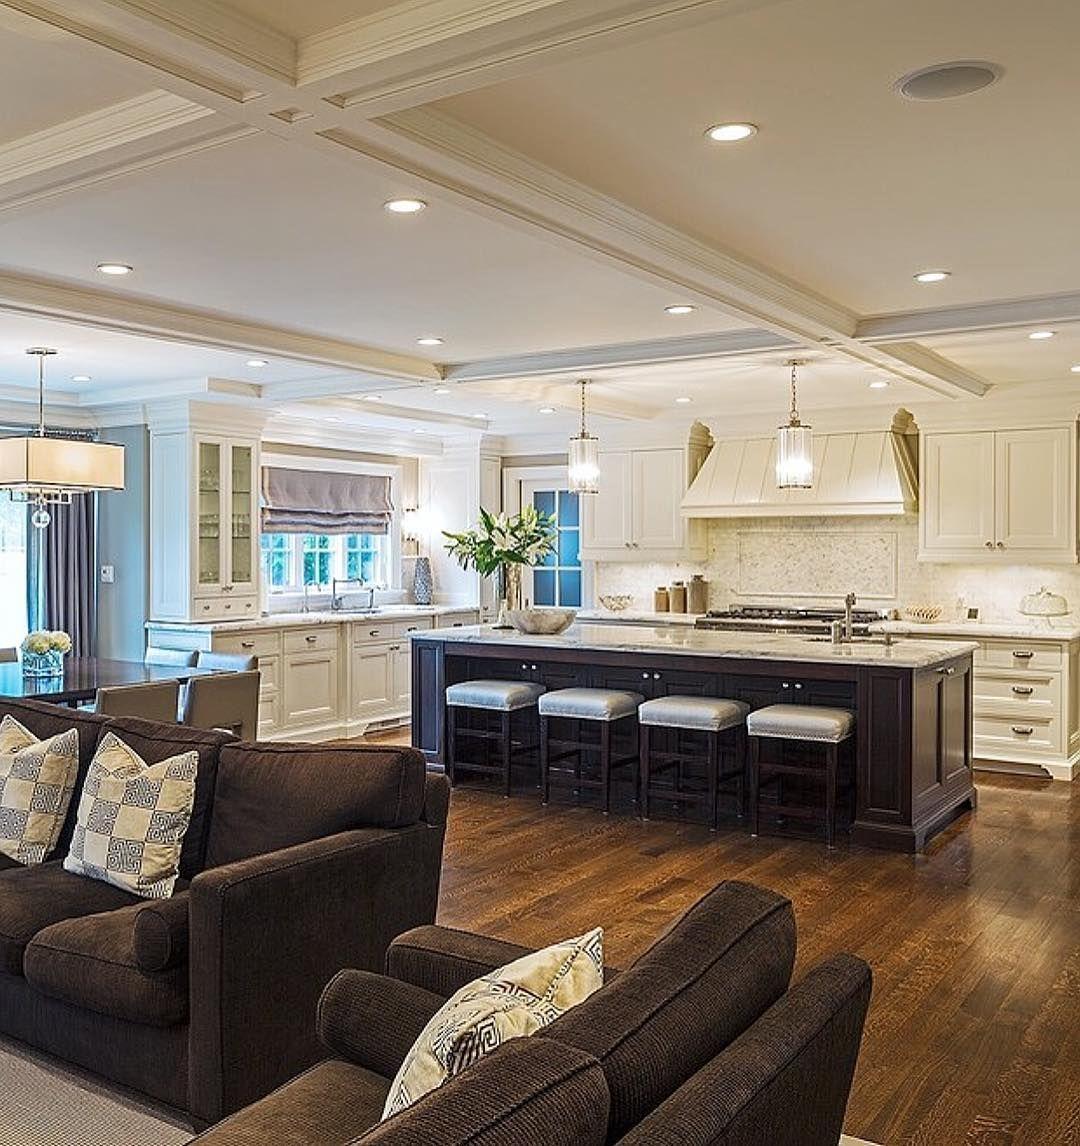 7 kitchen island ideas with modern look stylish designs on extraordinary kitchen remodel ideas id=80811